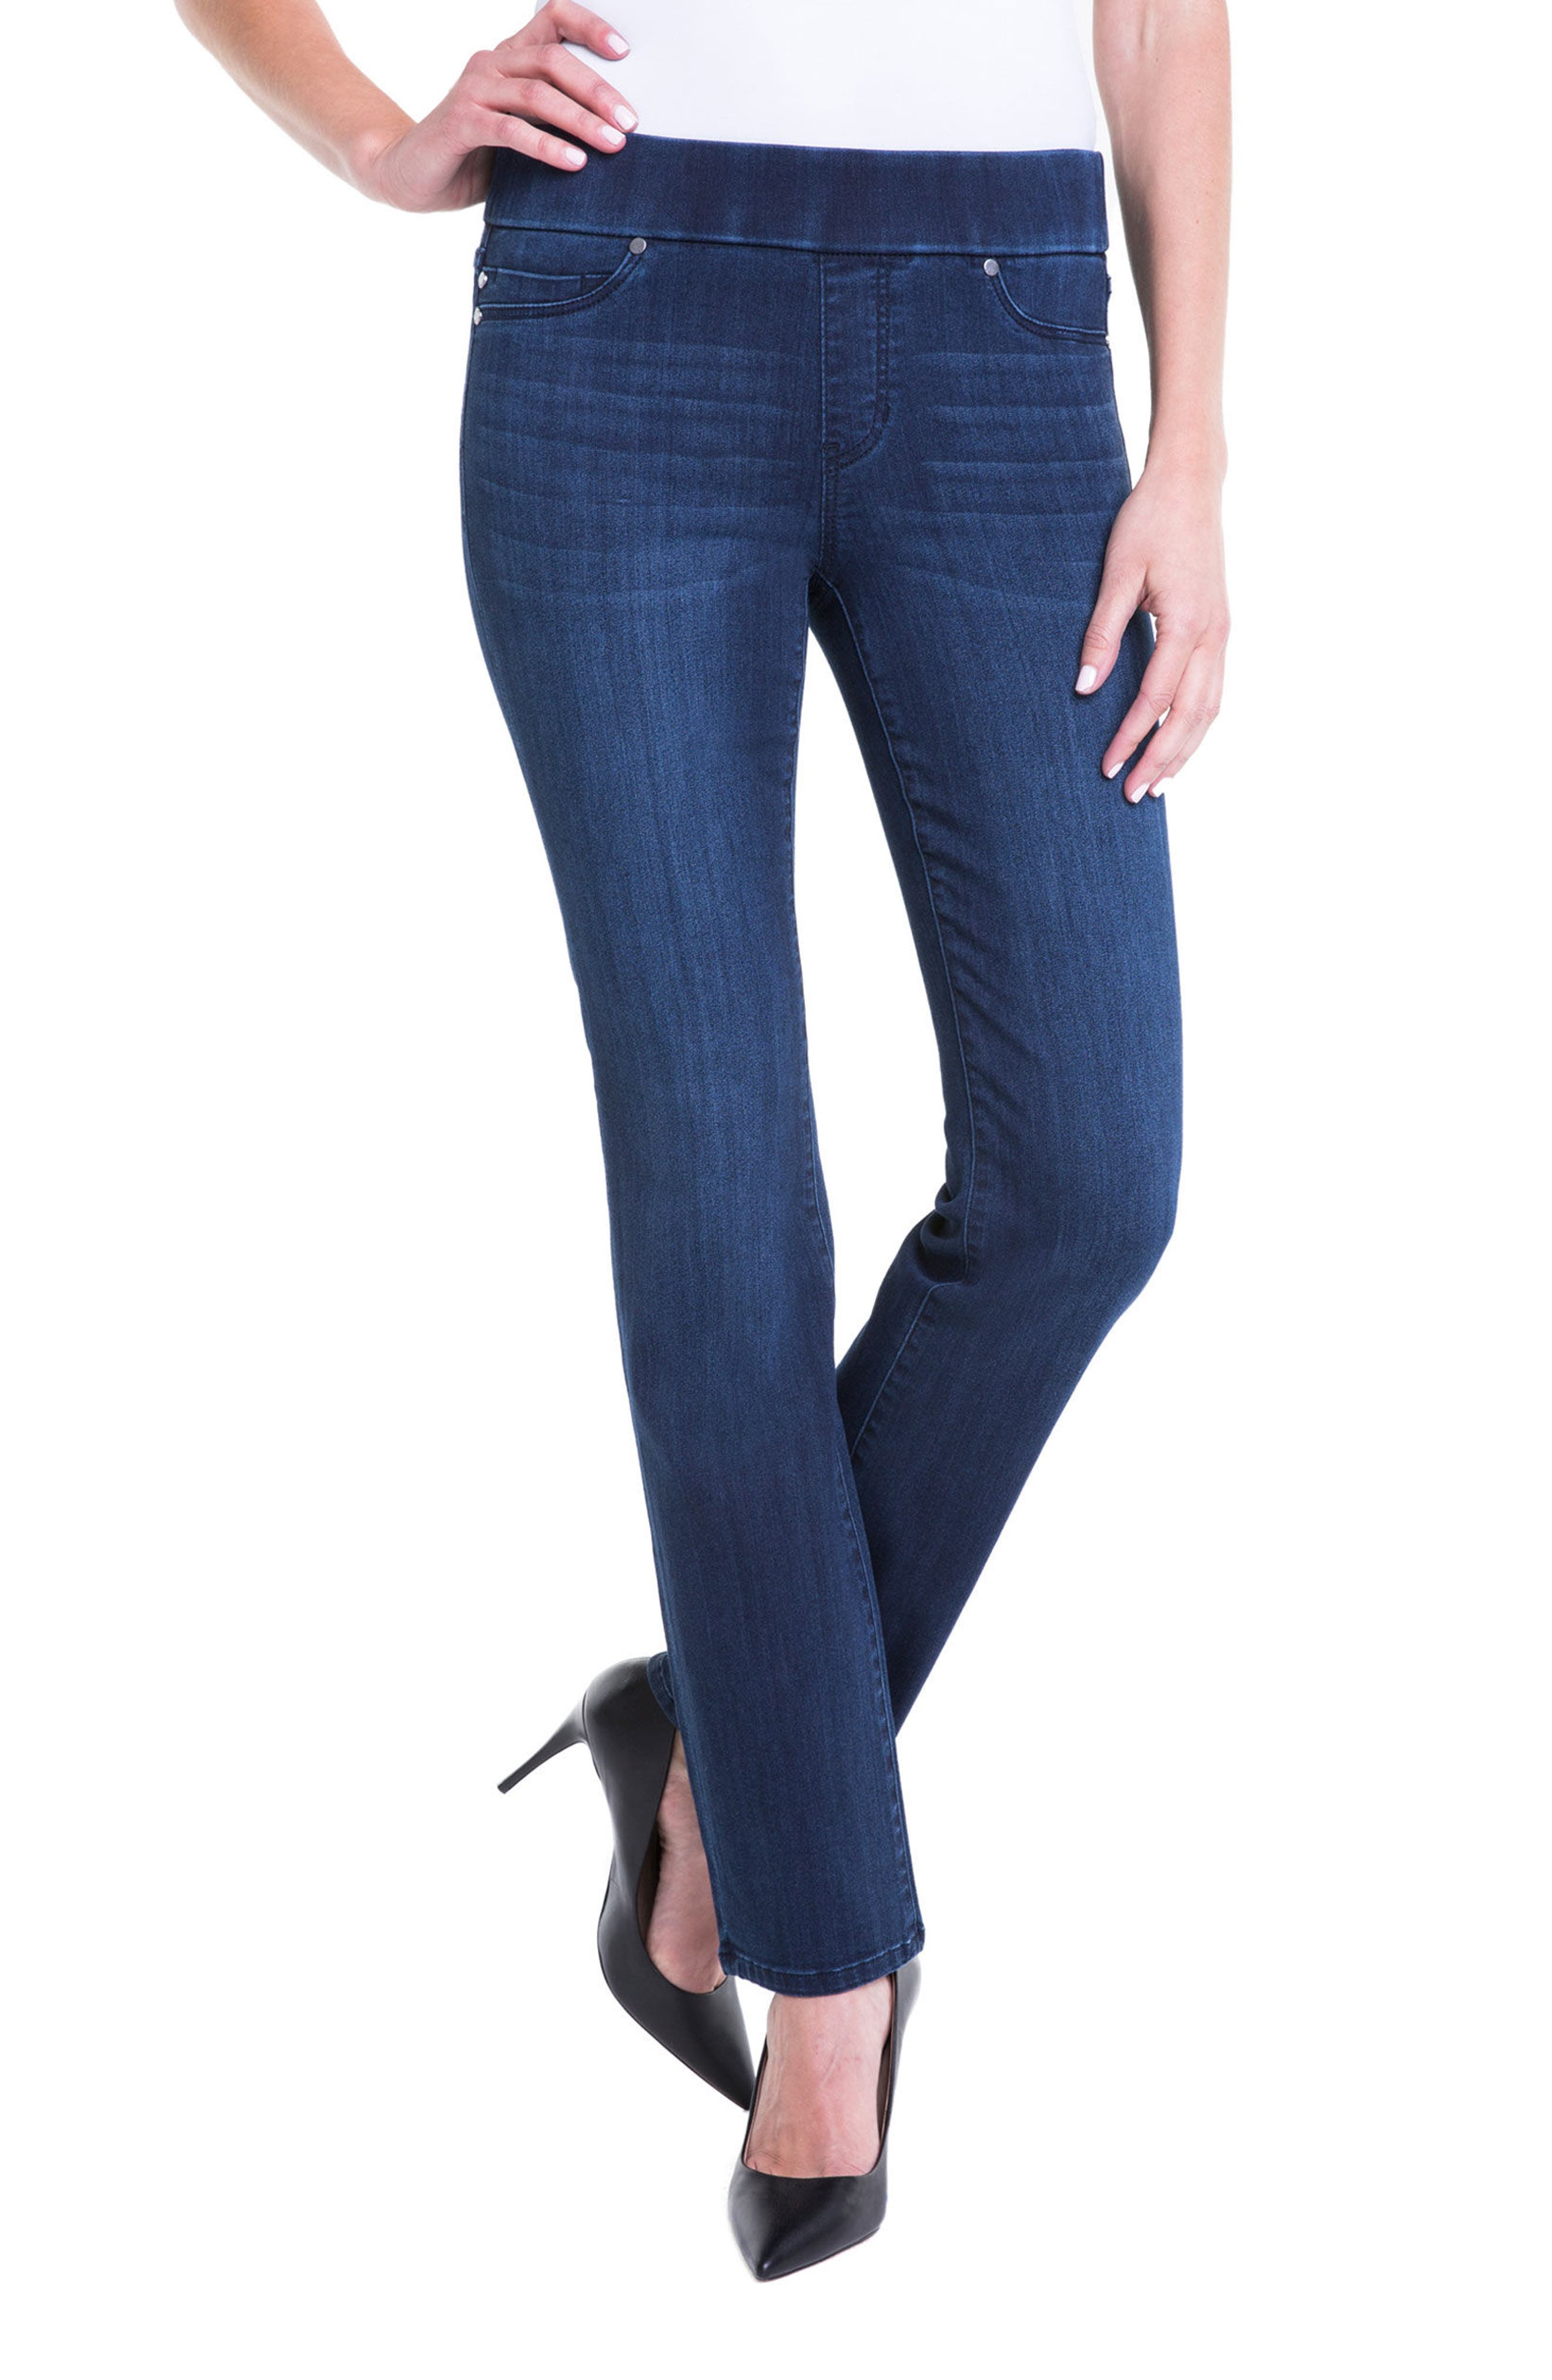 Liverpool Jeans Company Jillian Pull-On Straight Leg Jeans (Estrella Med Dark)